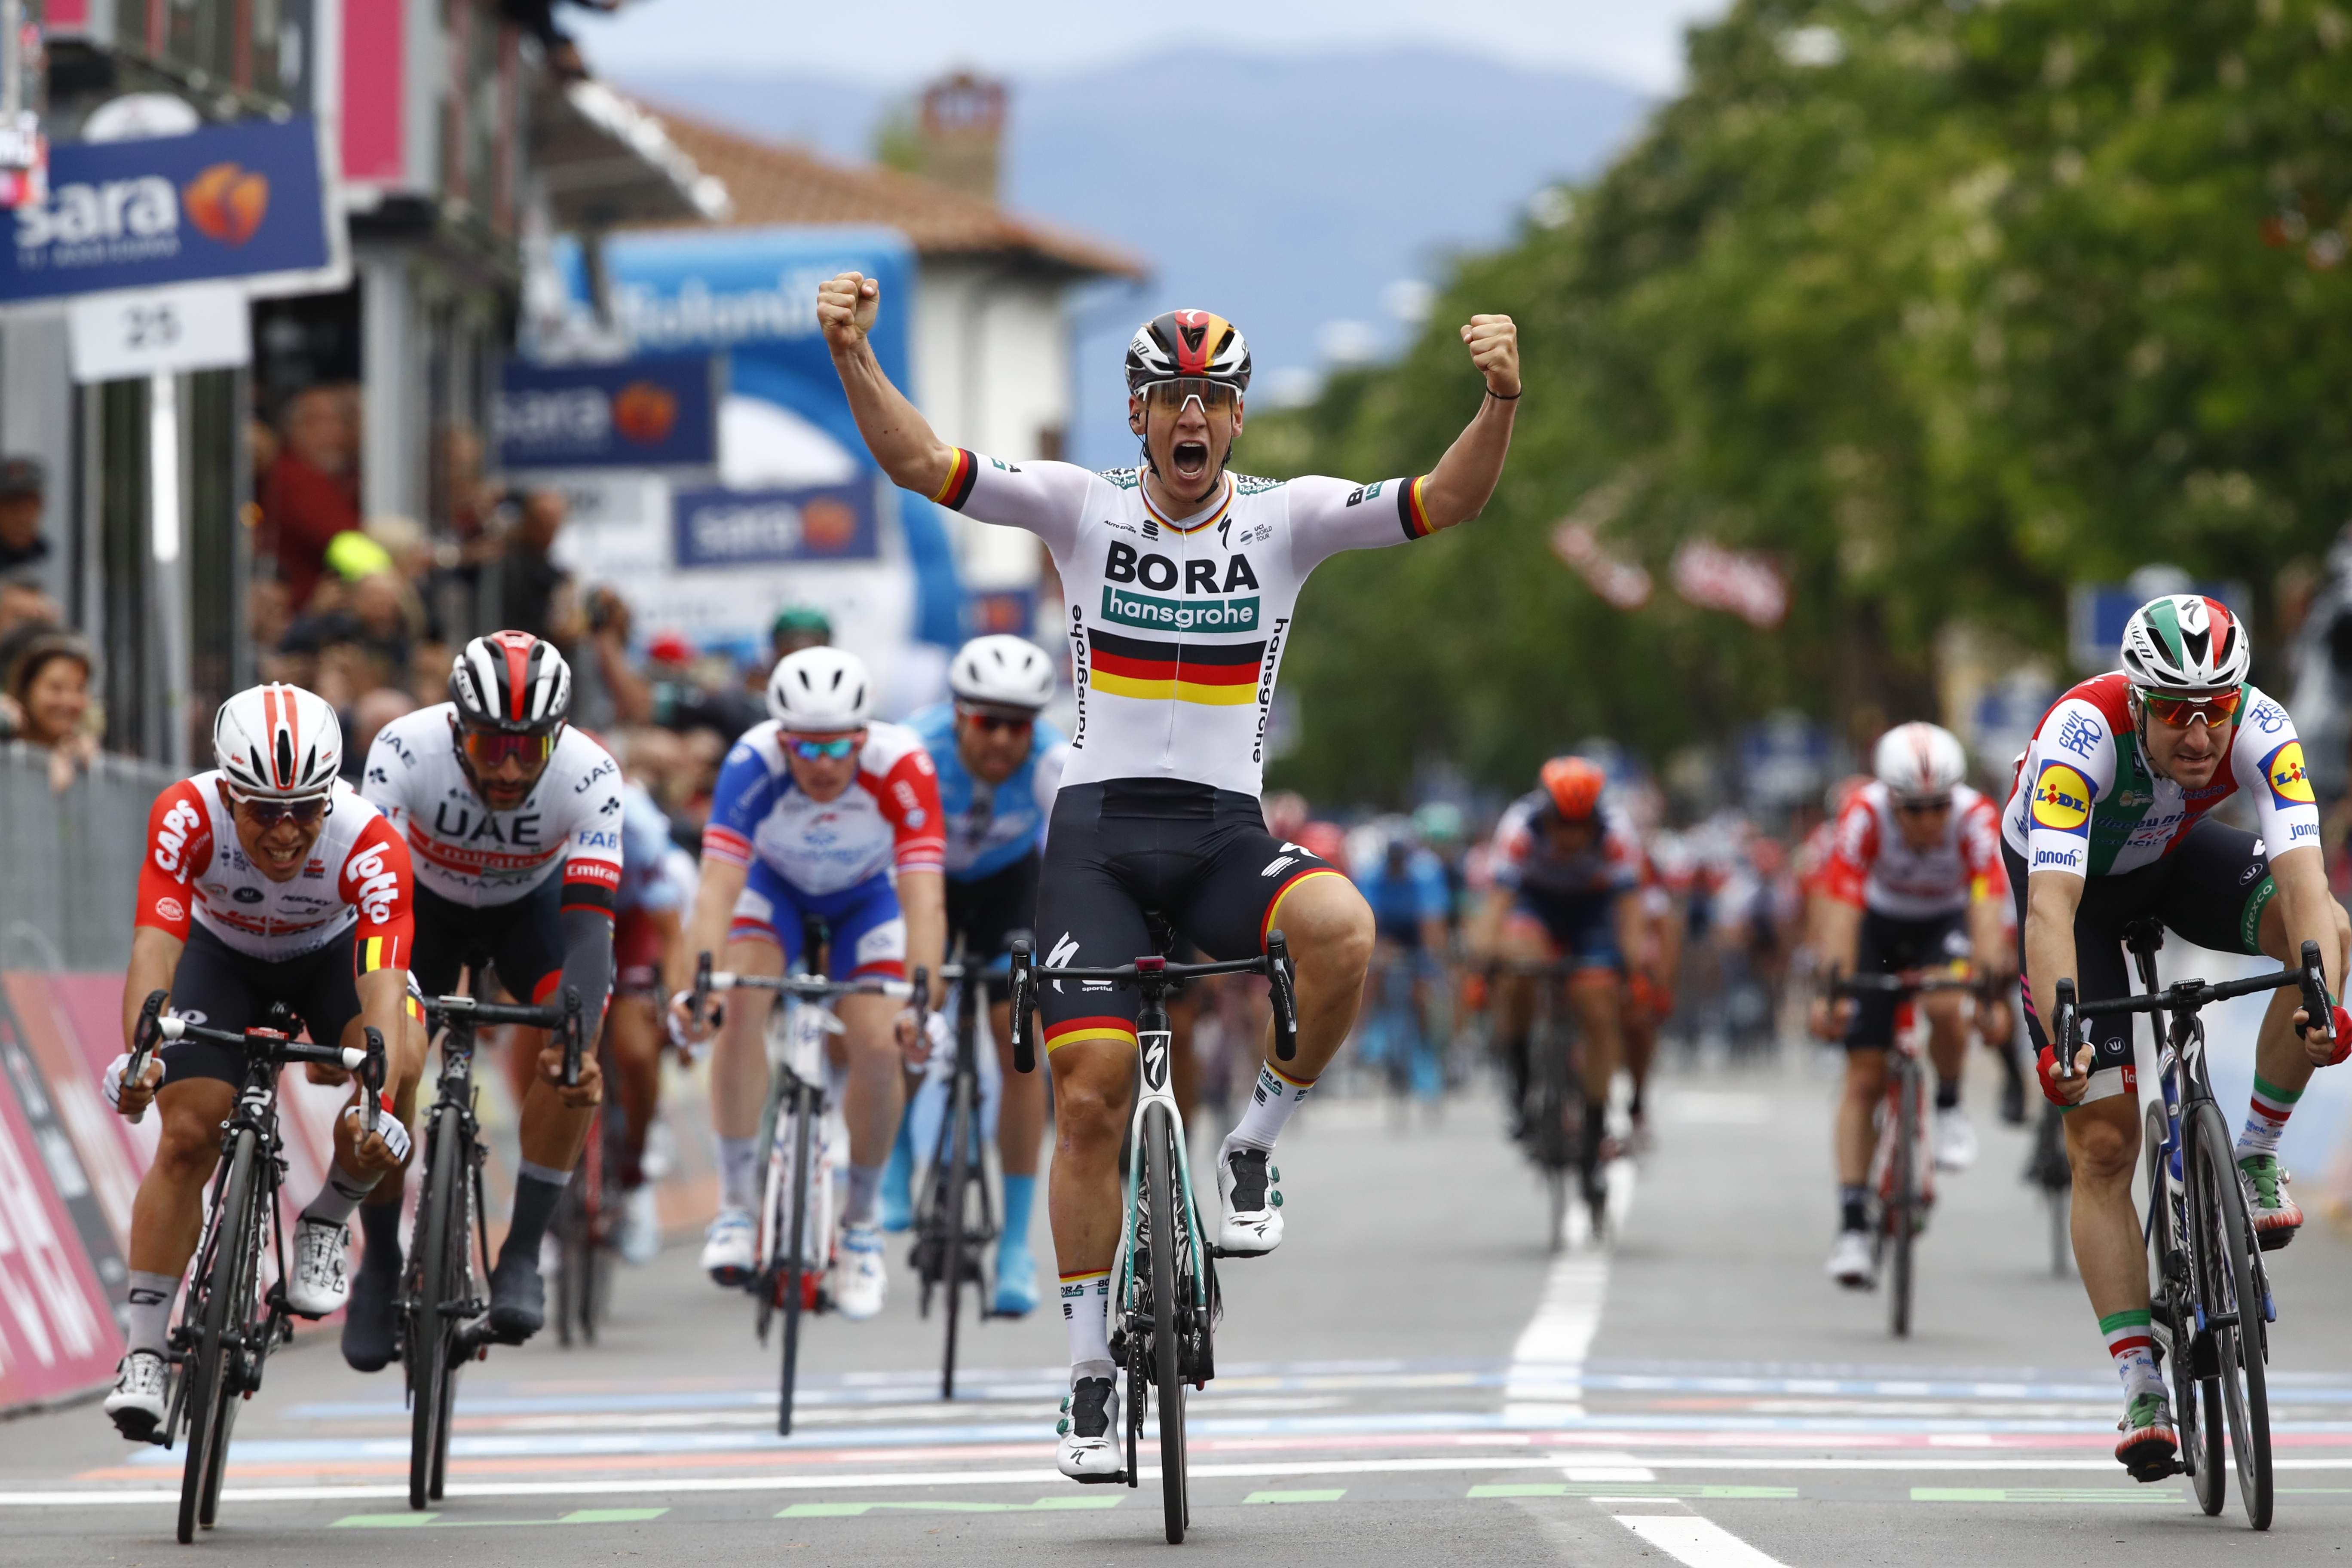 Cyclisme - Giro - Giro : Ackermann gagne au sprint la 2e étape